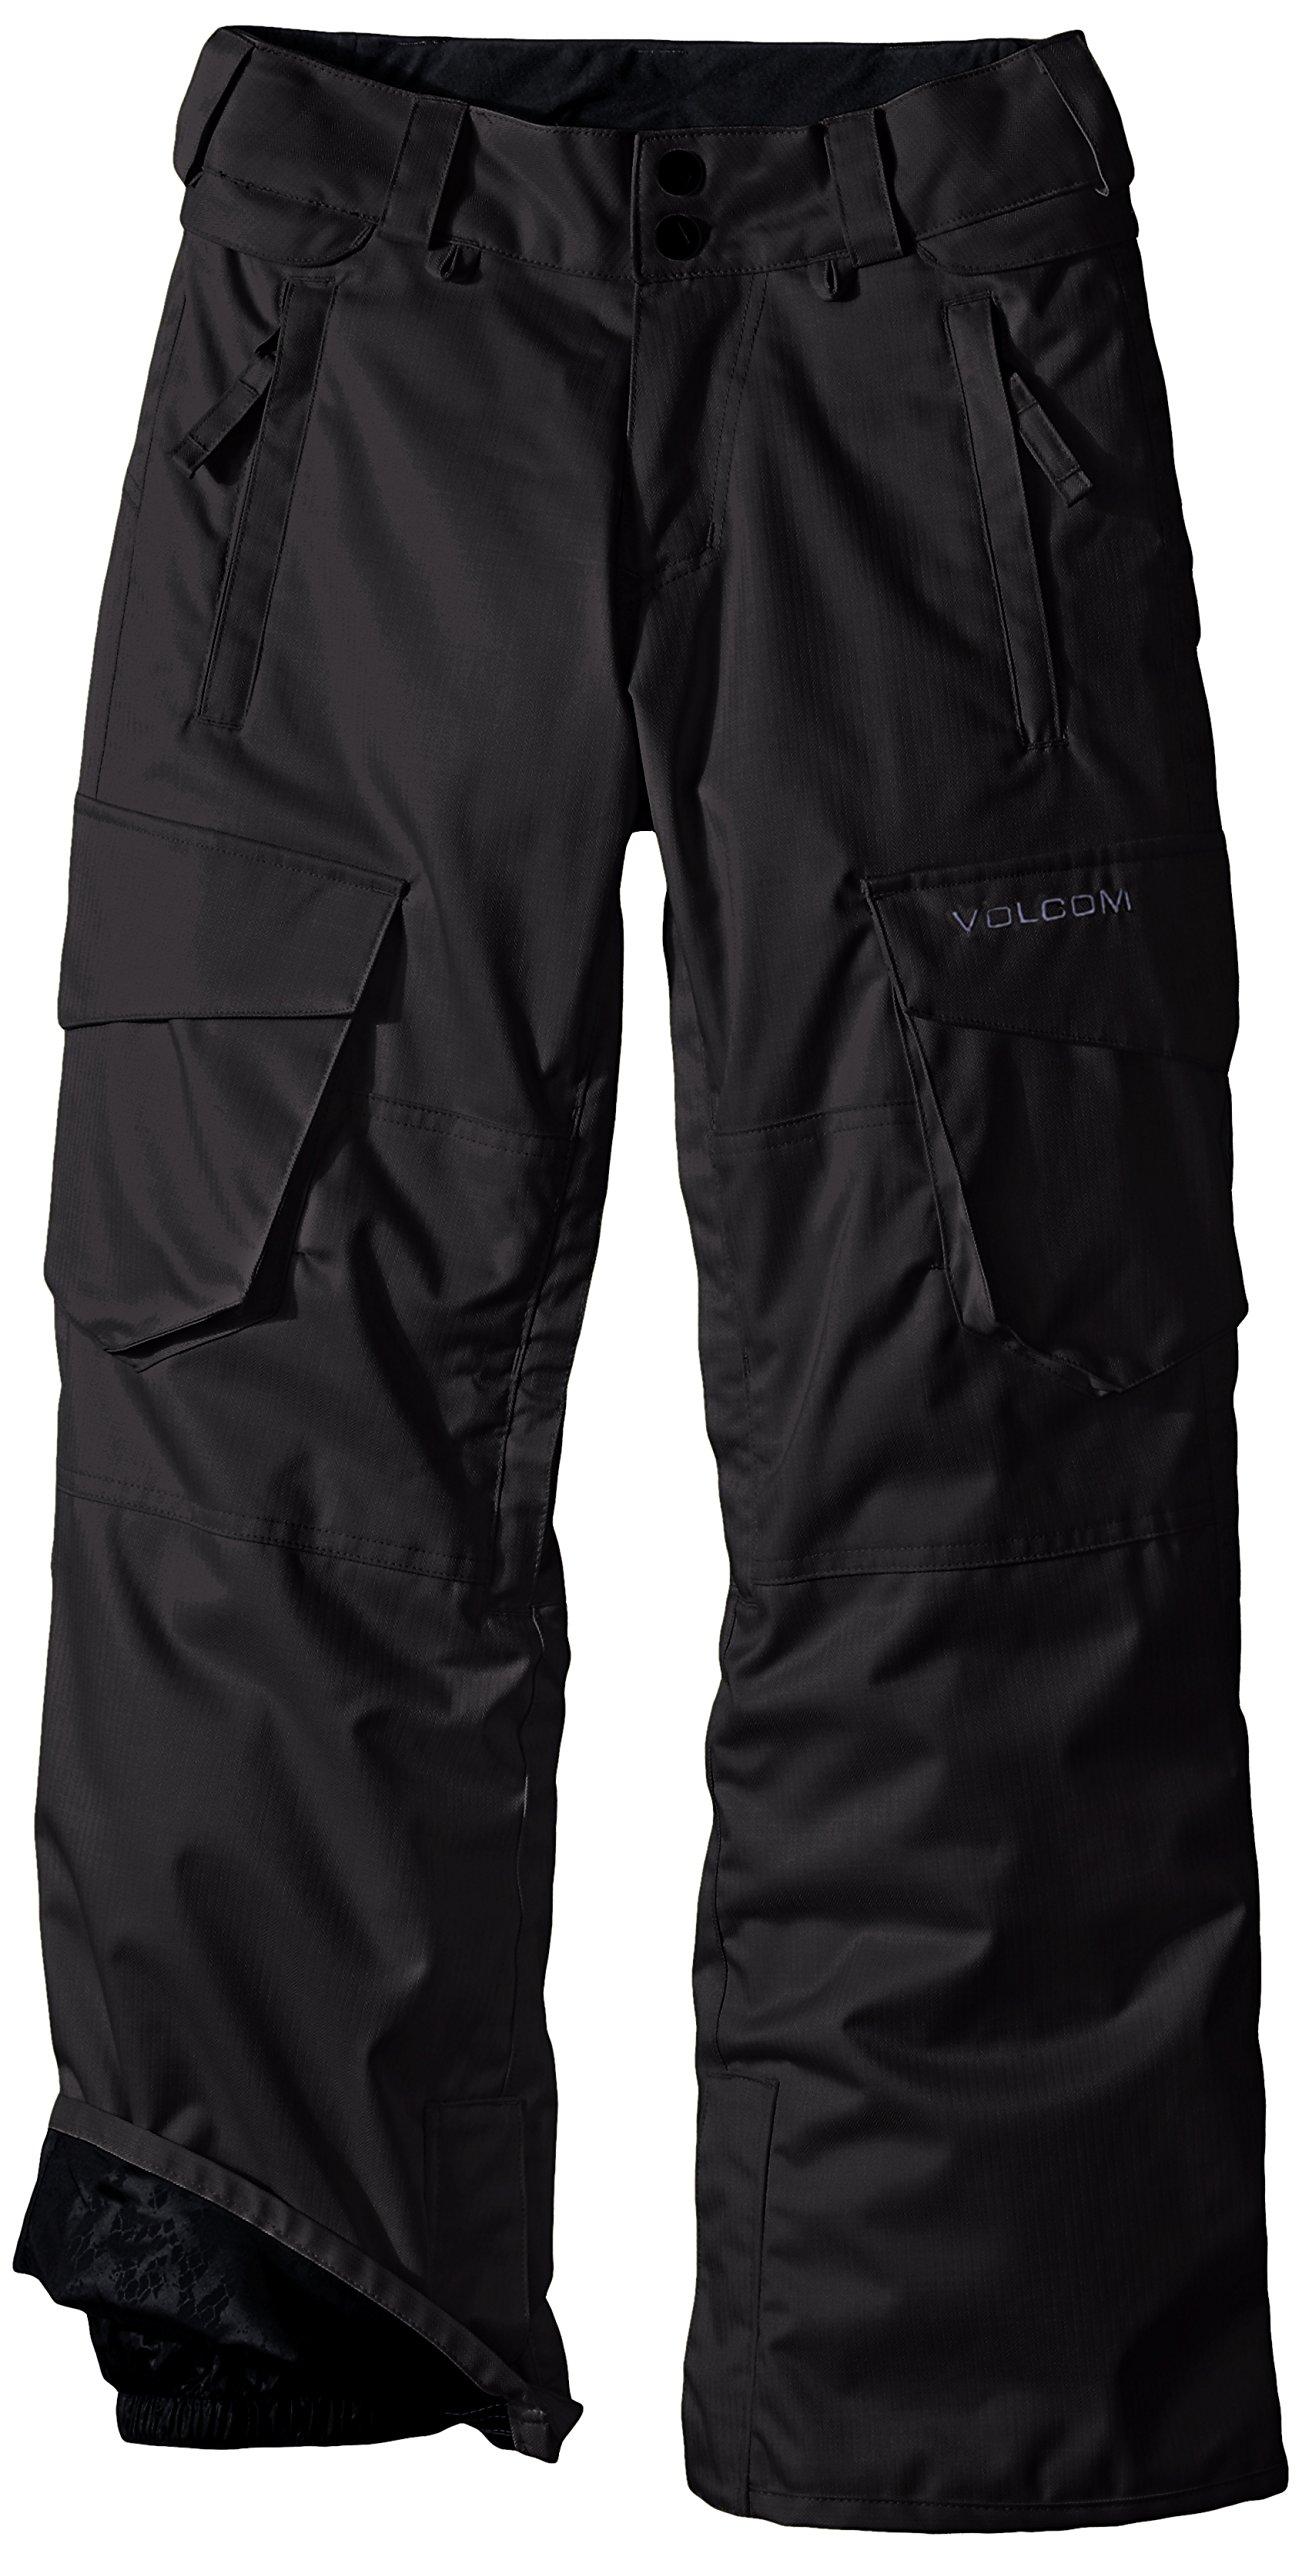 Volcom Big Boys' Folsom Insulated Pant, Black, X-Small